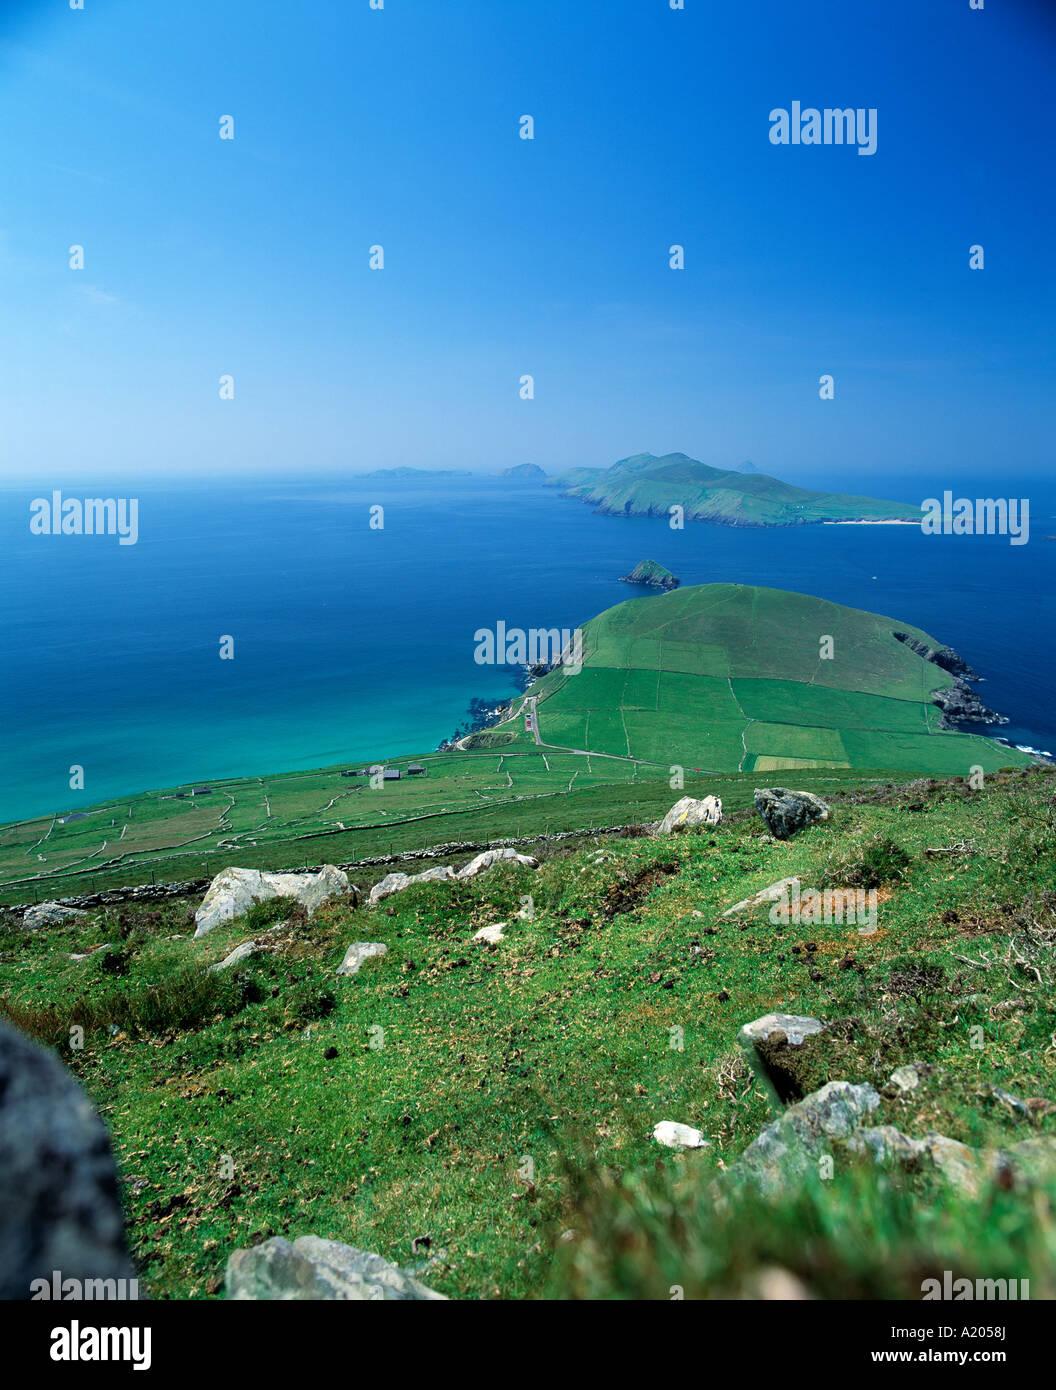 ireland, county kerry, dingle peninsula, slea dunmore head,  blasket islands in background, wild atlantic way - Stock Image